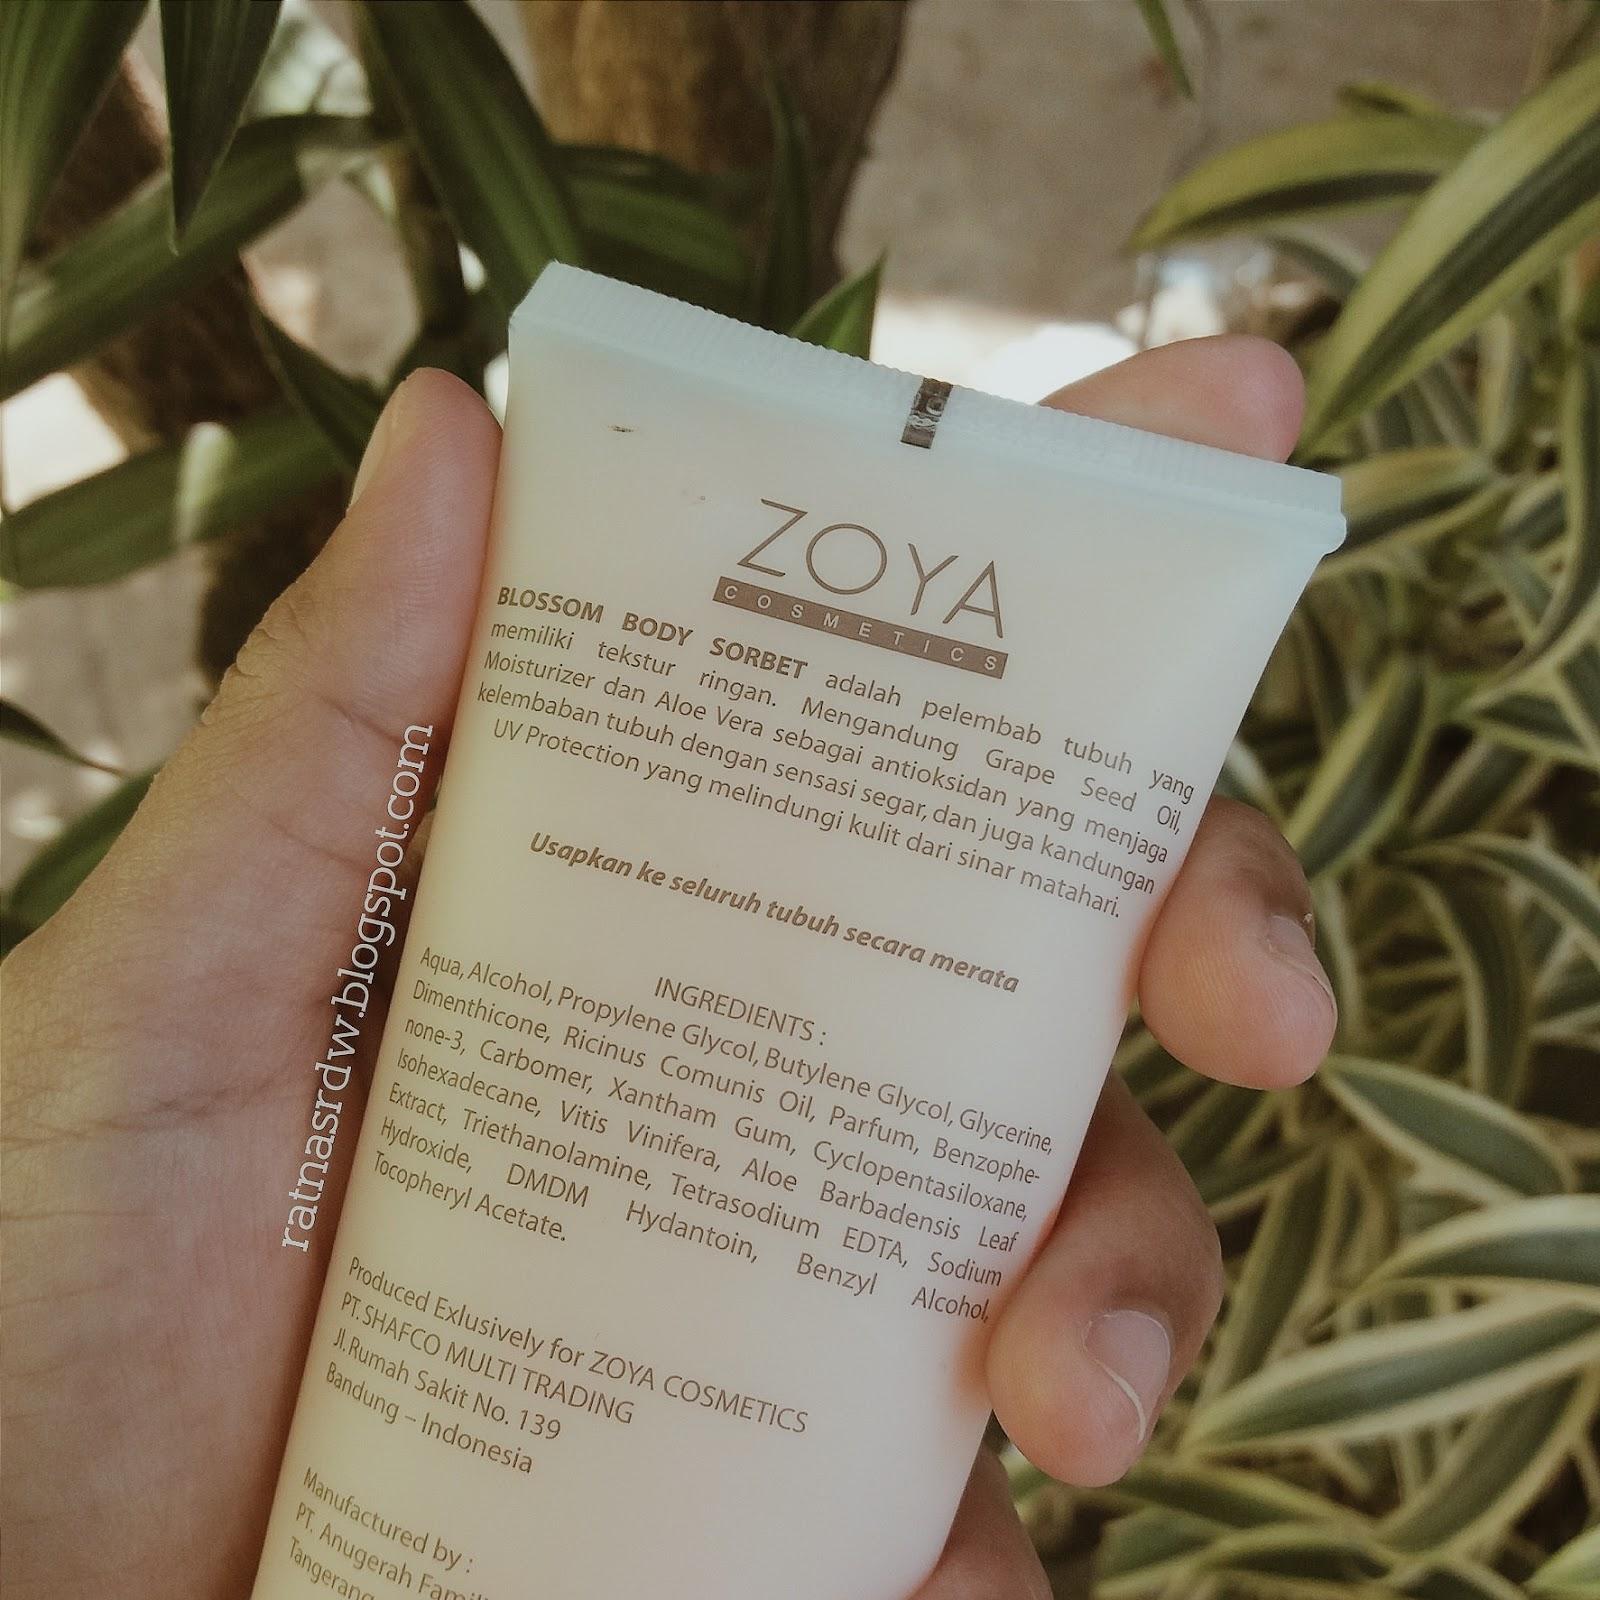 Zoya Cosmetics Ultramoisse Raspberry Sorbet 16 Daftar Harga Lipstick 18 Pinnacota 321363 Kesimpulan Aku Suka Si Pake Body Varian Blossom